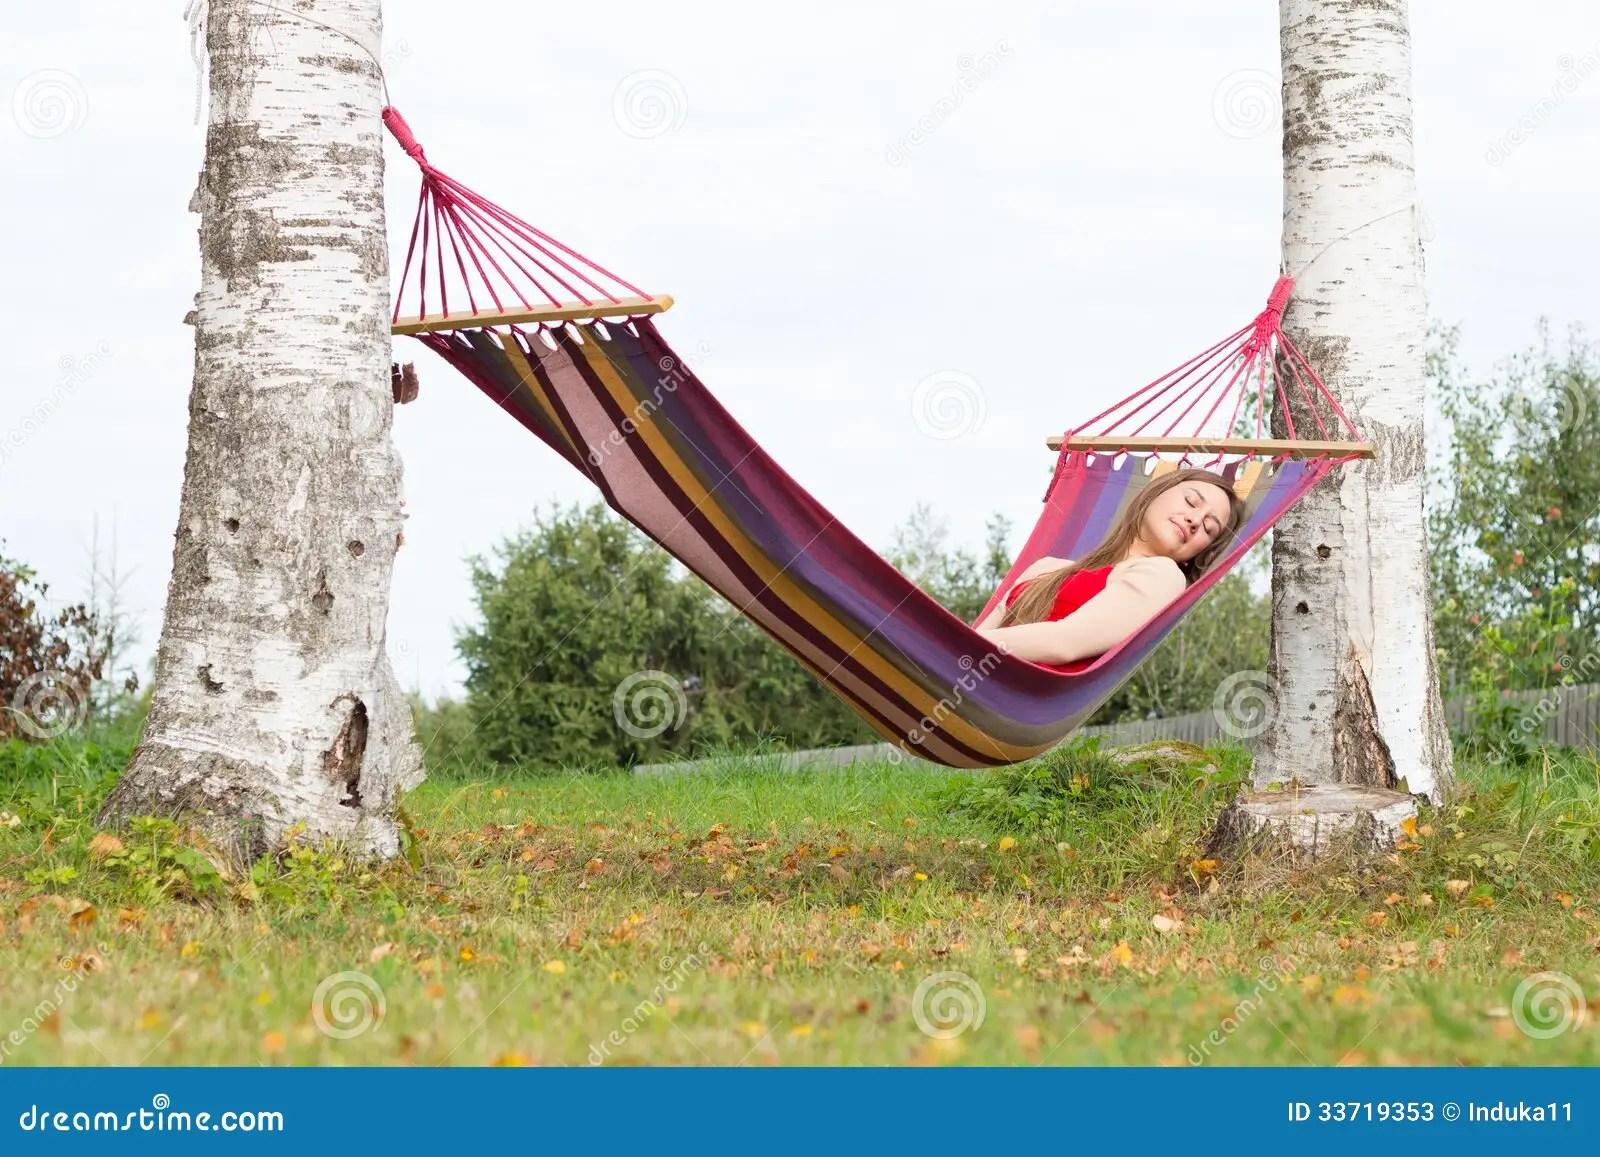 Woman Sleeping In Colorful Hammock Stock Image